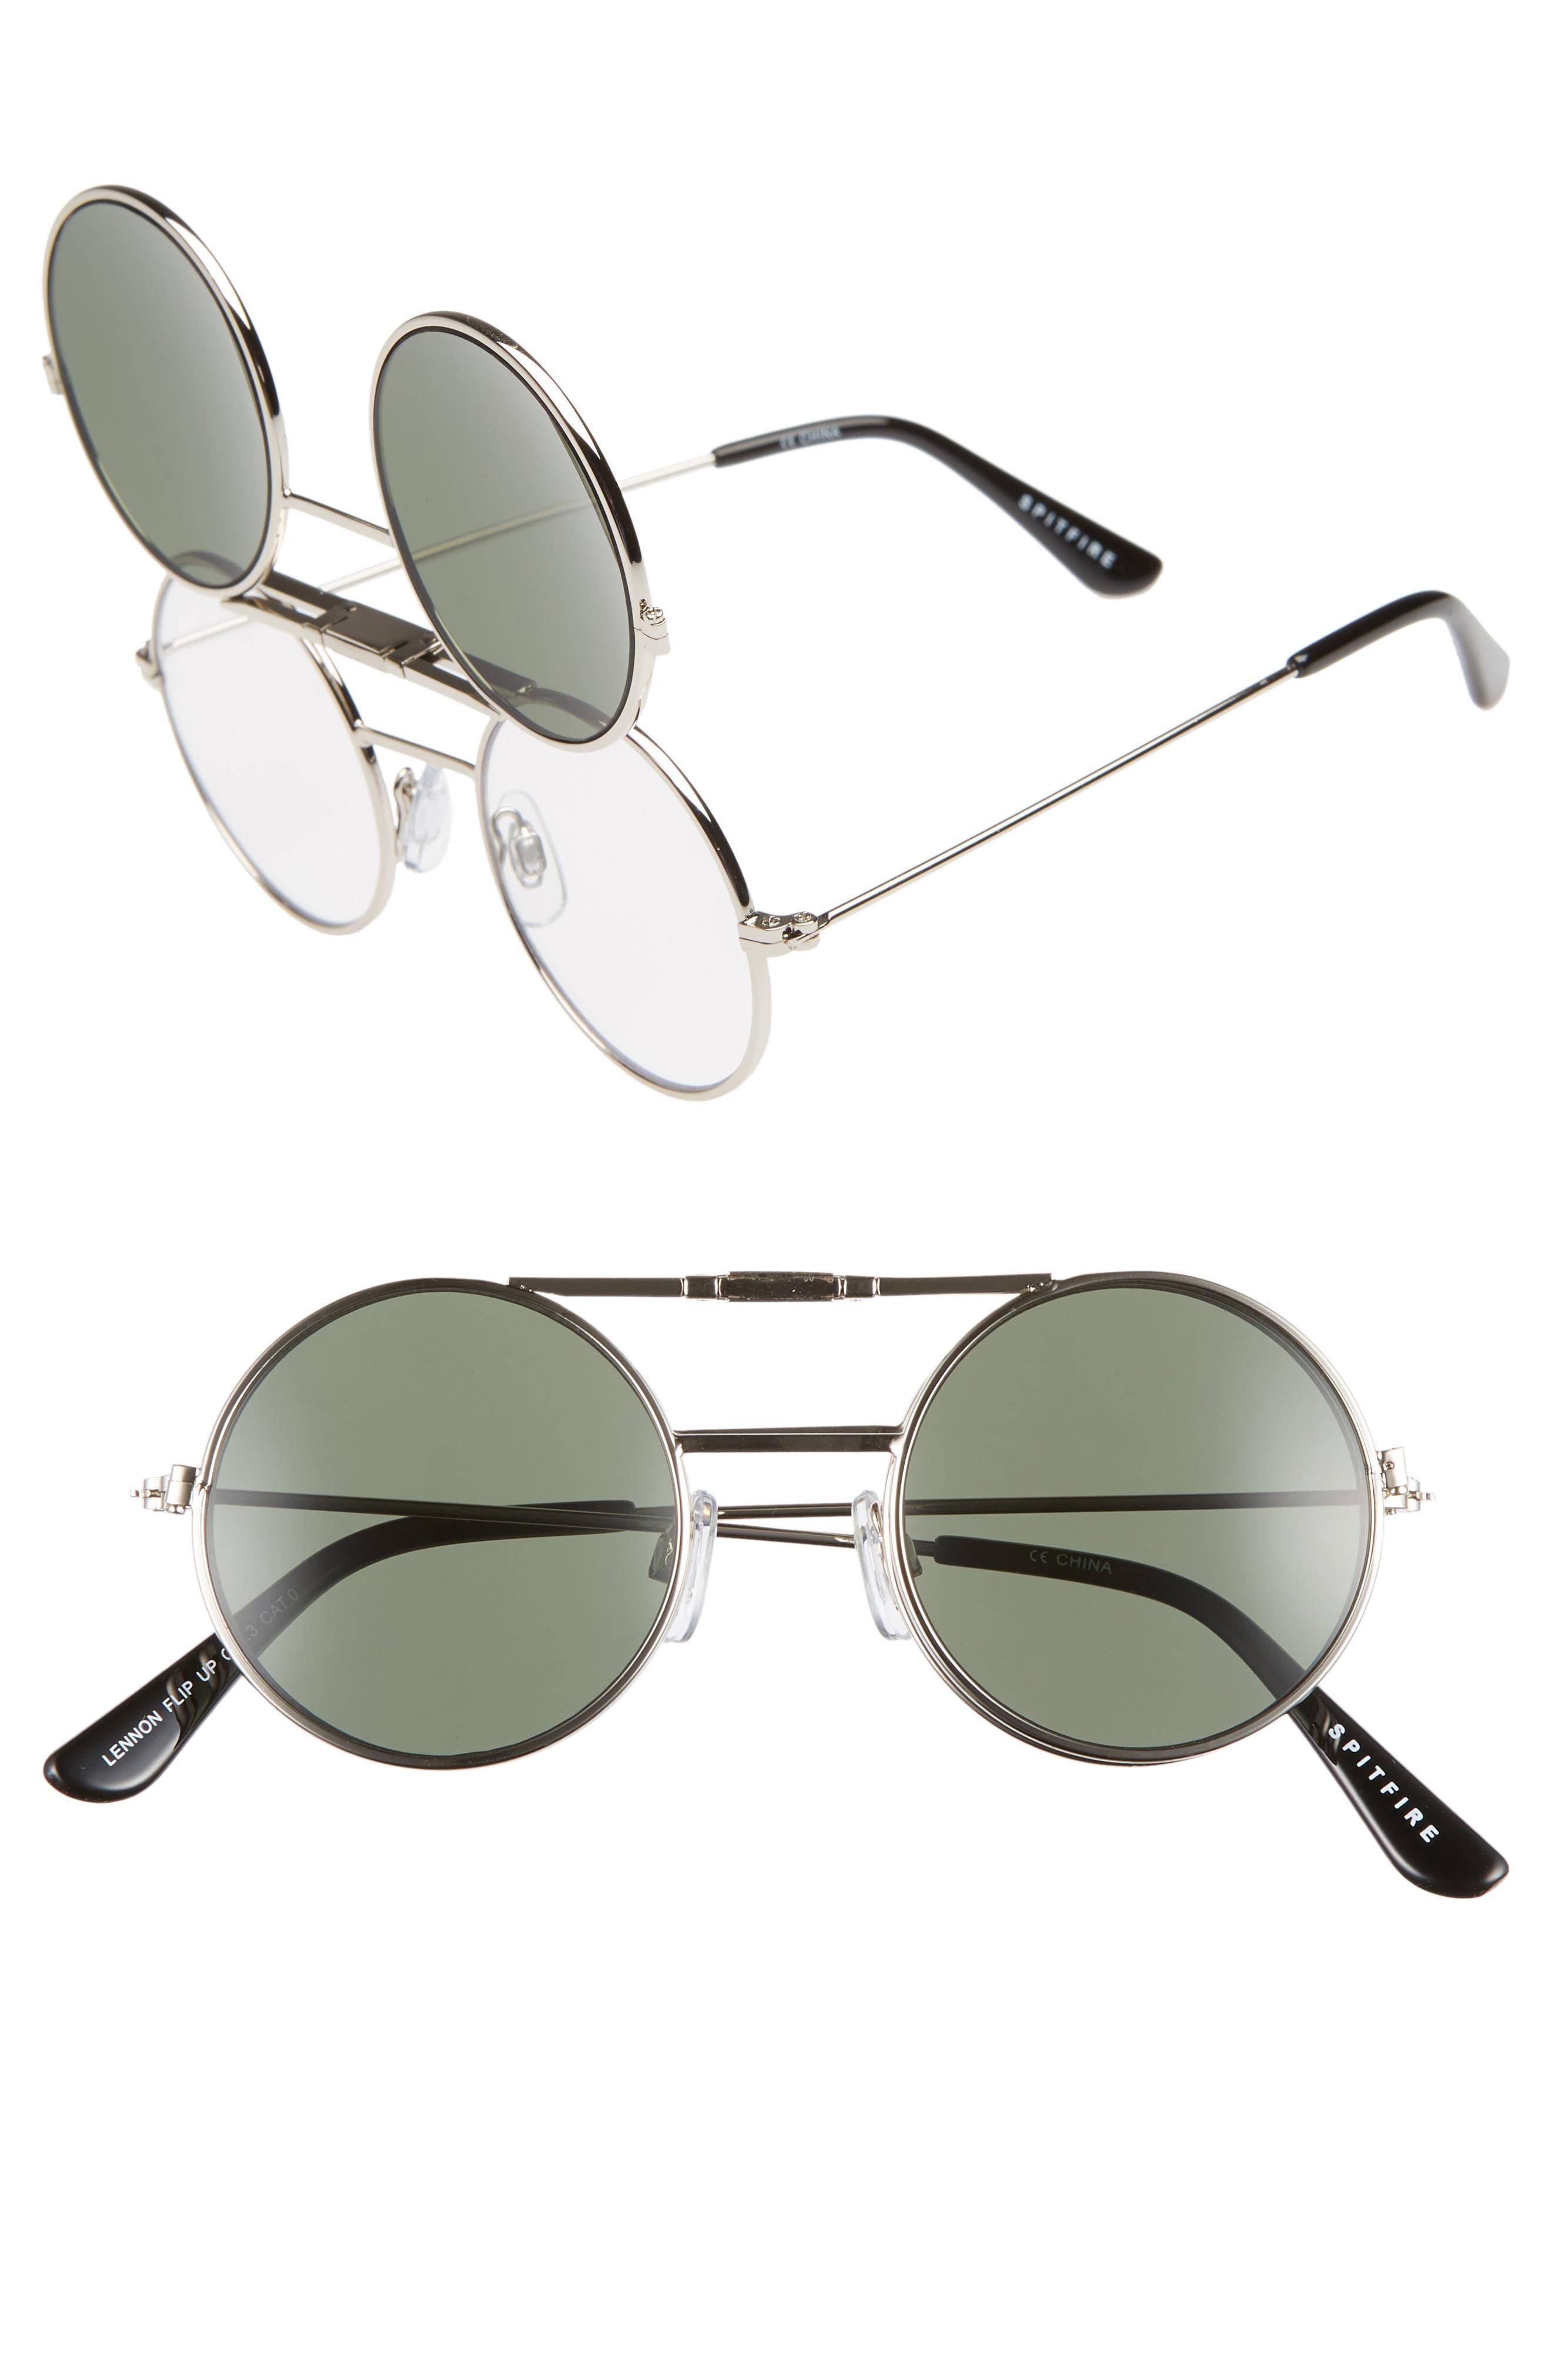 SPITFIRE Lennon Flip 45Mm Round Sunglasses - Silver/ Black